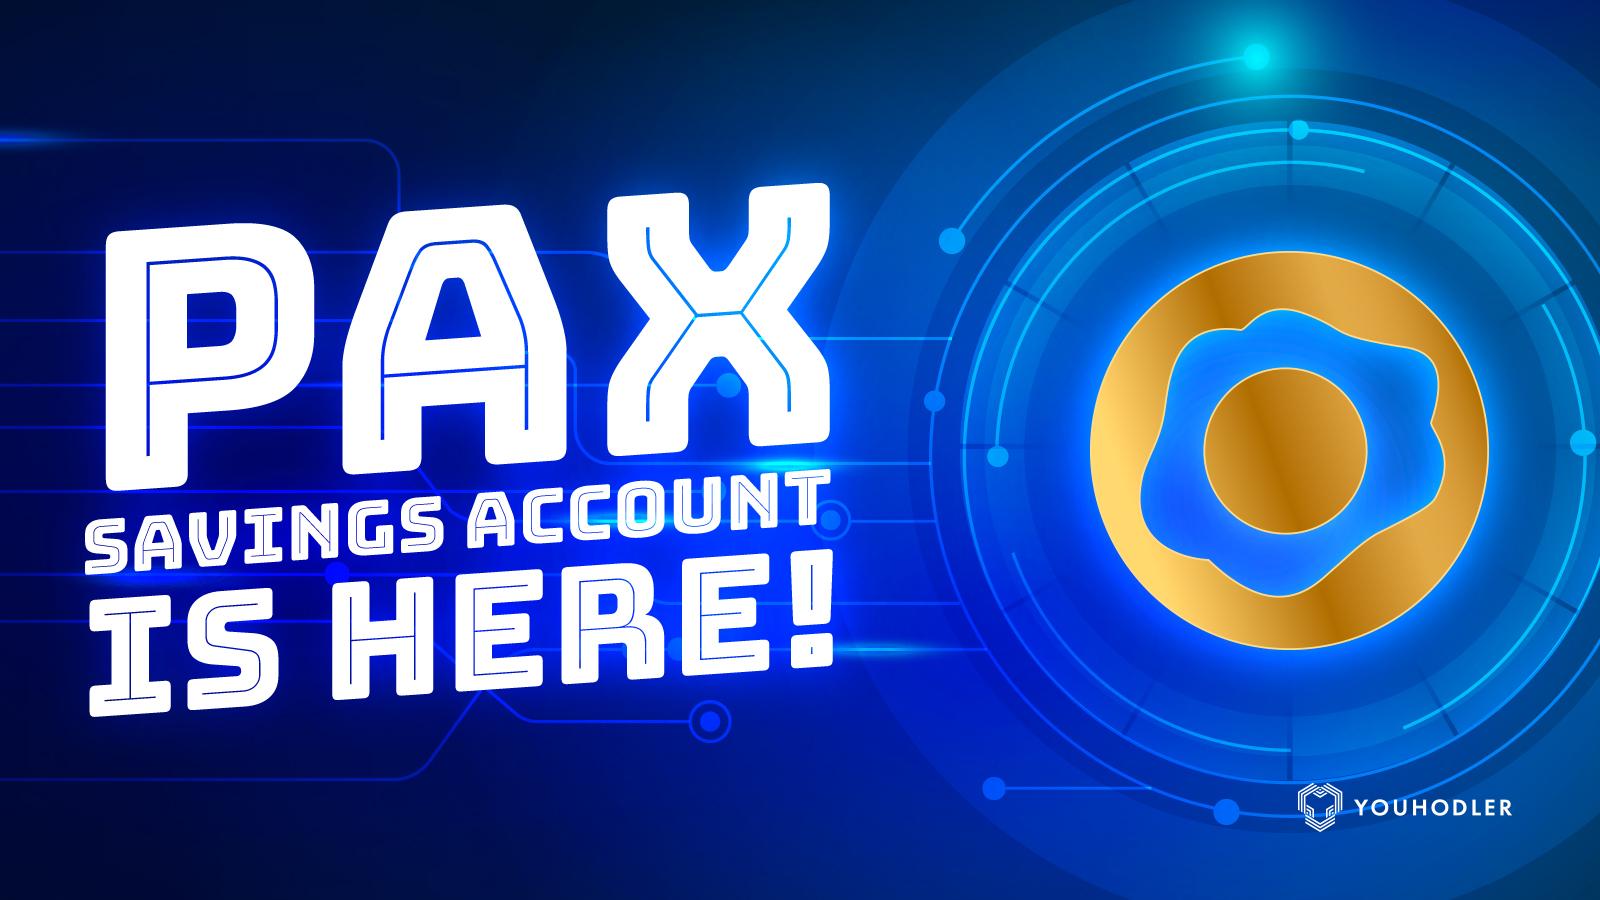 pax paxos youhodler